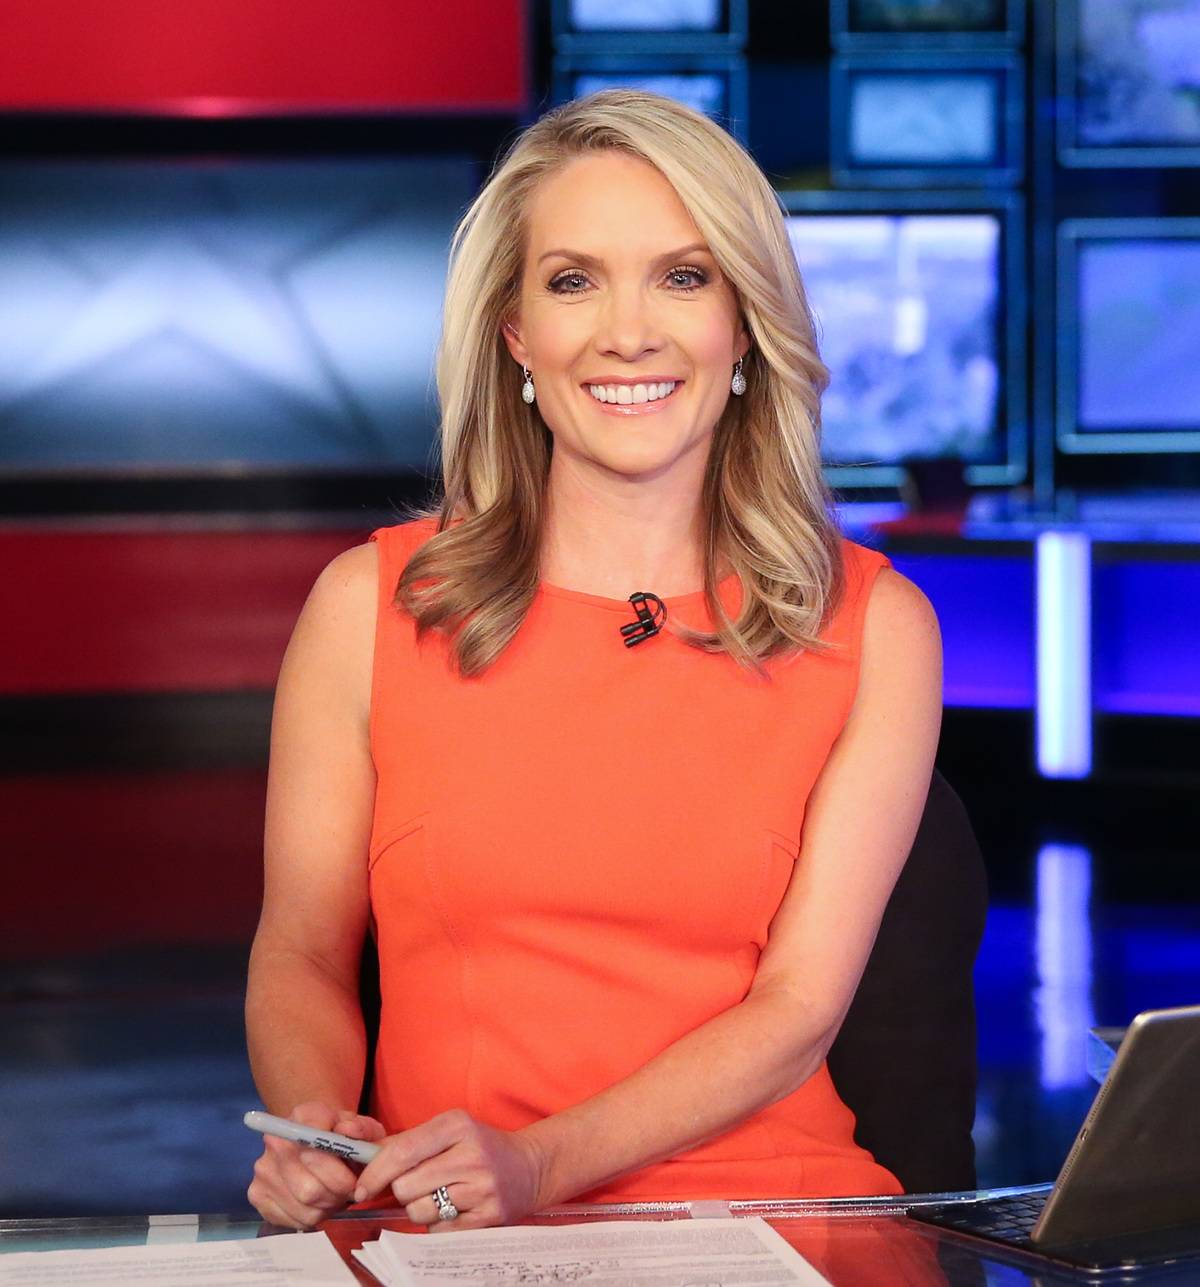 Dierks Bentley Interview With Fox News' Dana Perino